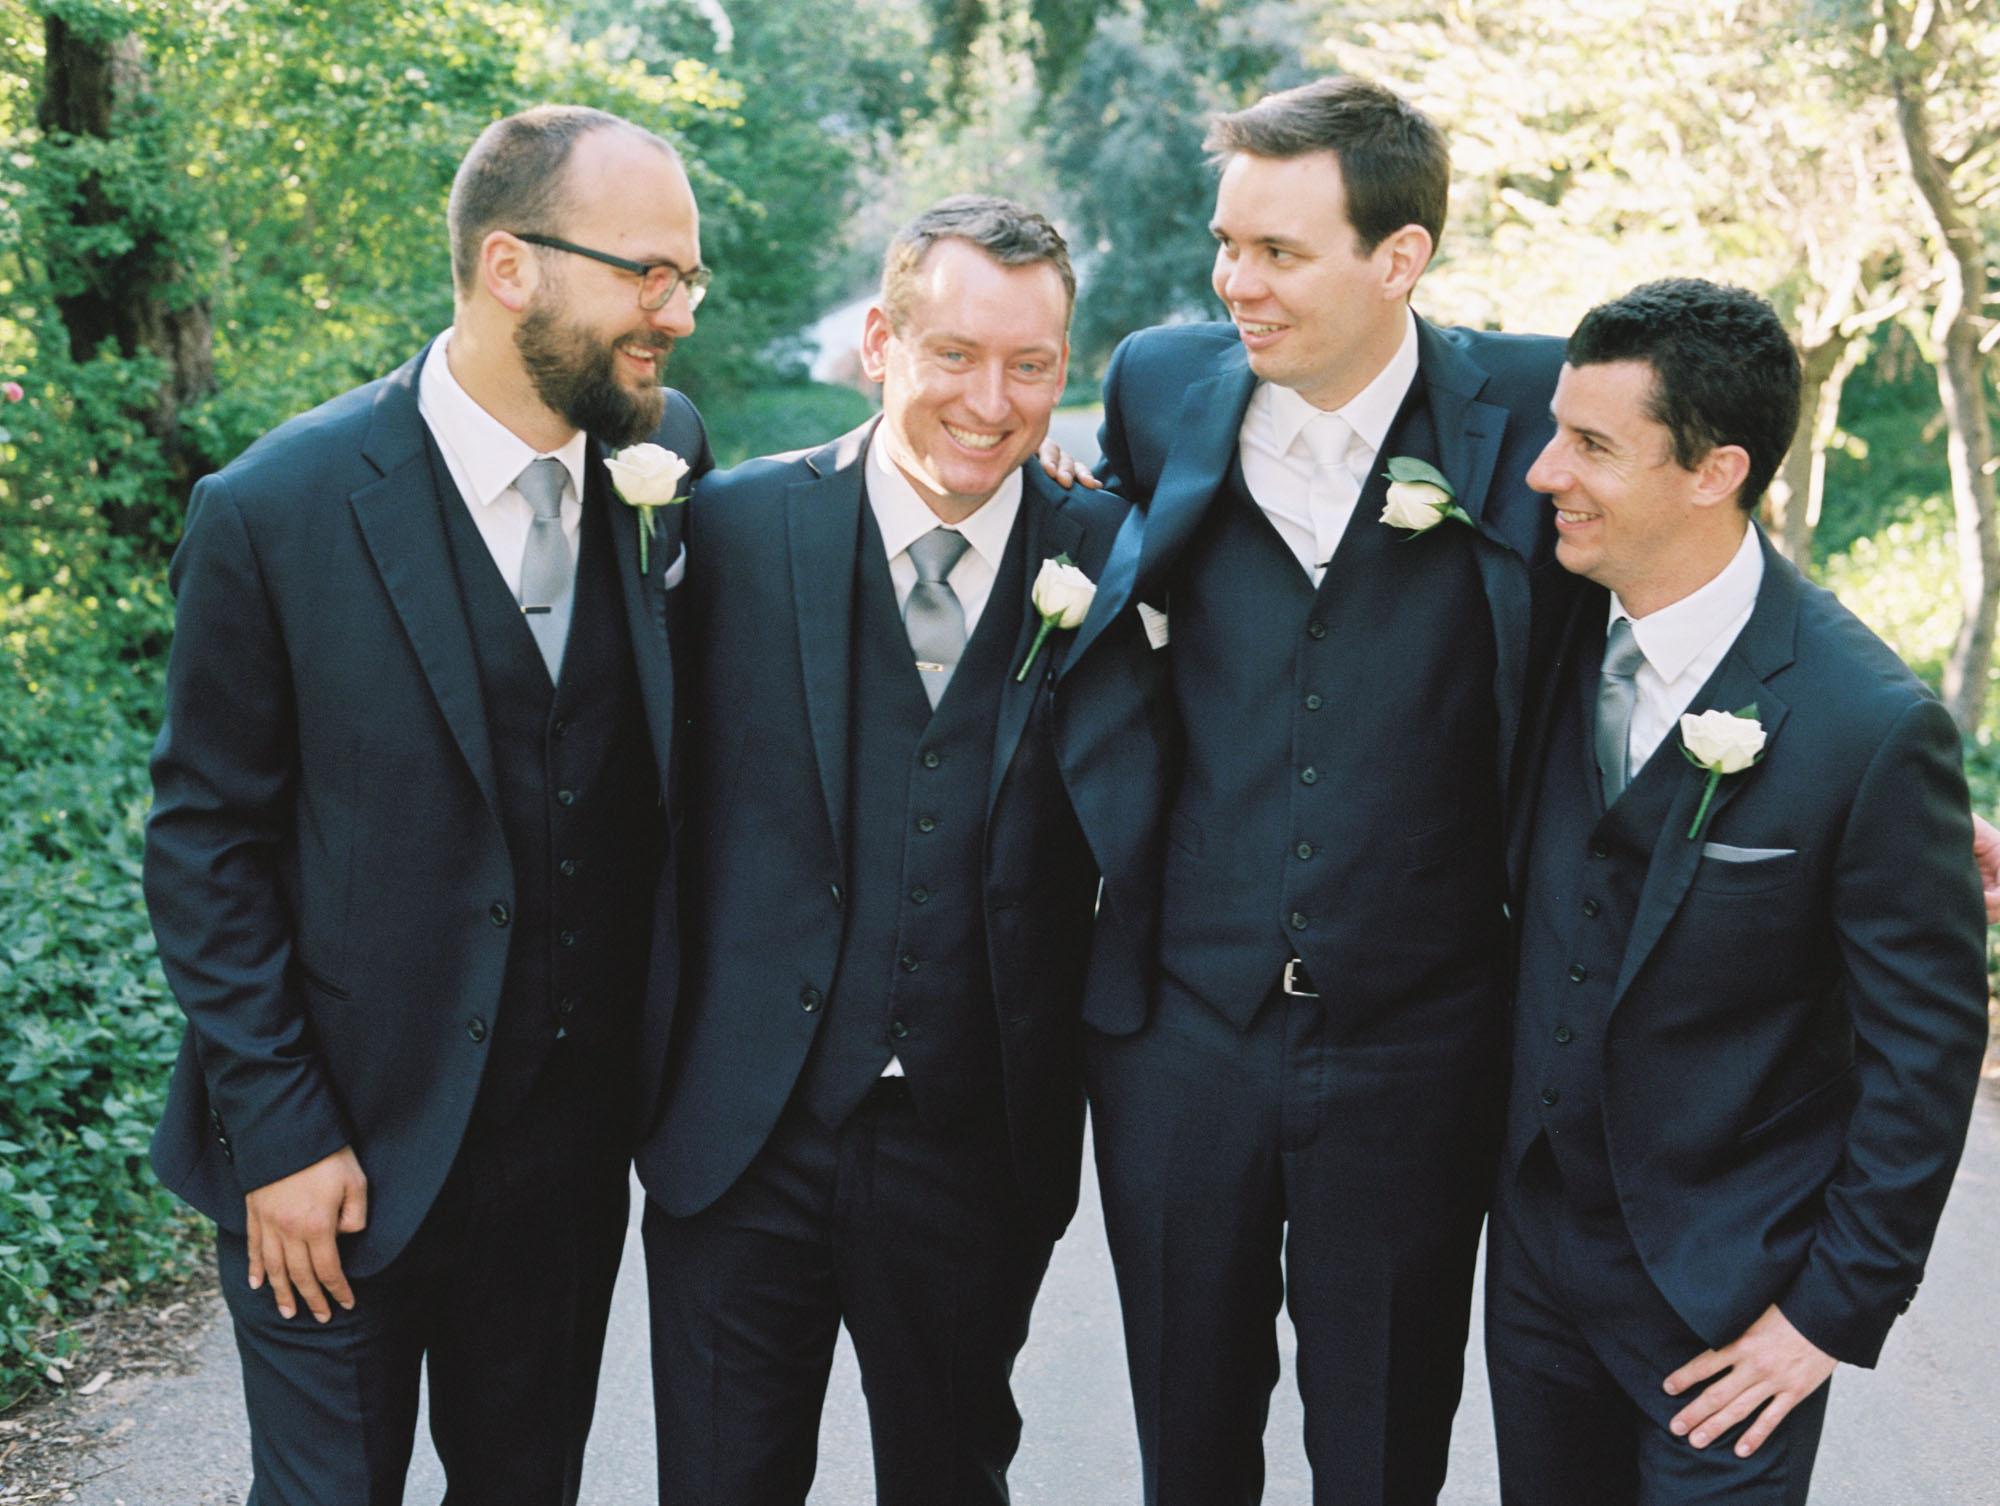 Glen-Ewin-Estate-wedding-photography-062.jpg